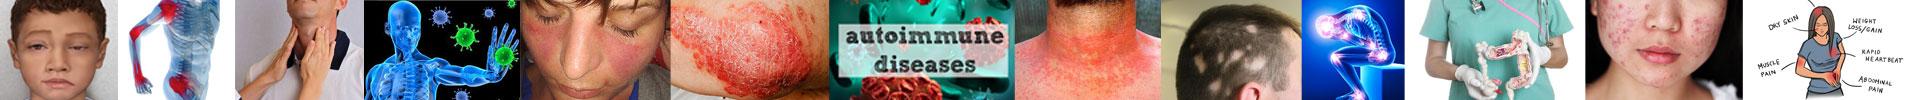 Natural_Treatment_autoimmune_myasthenia_rheumatoid_arthritis_fibromyalgia